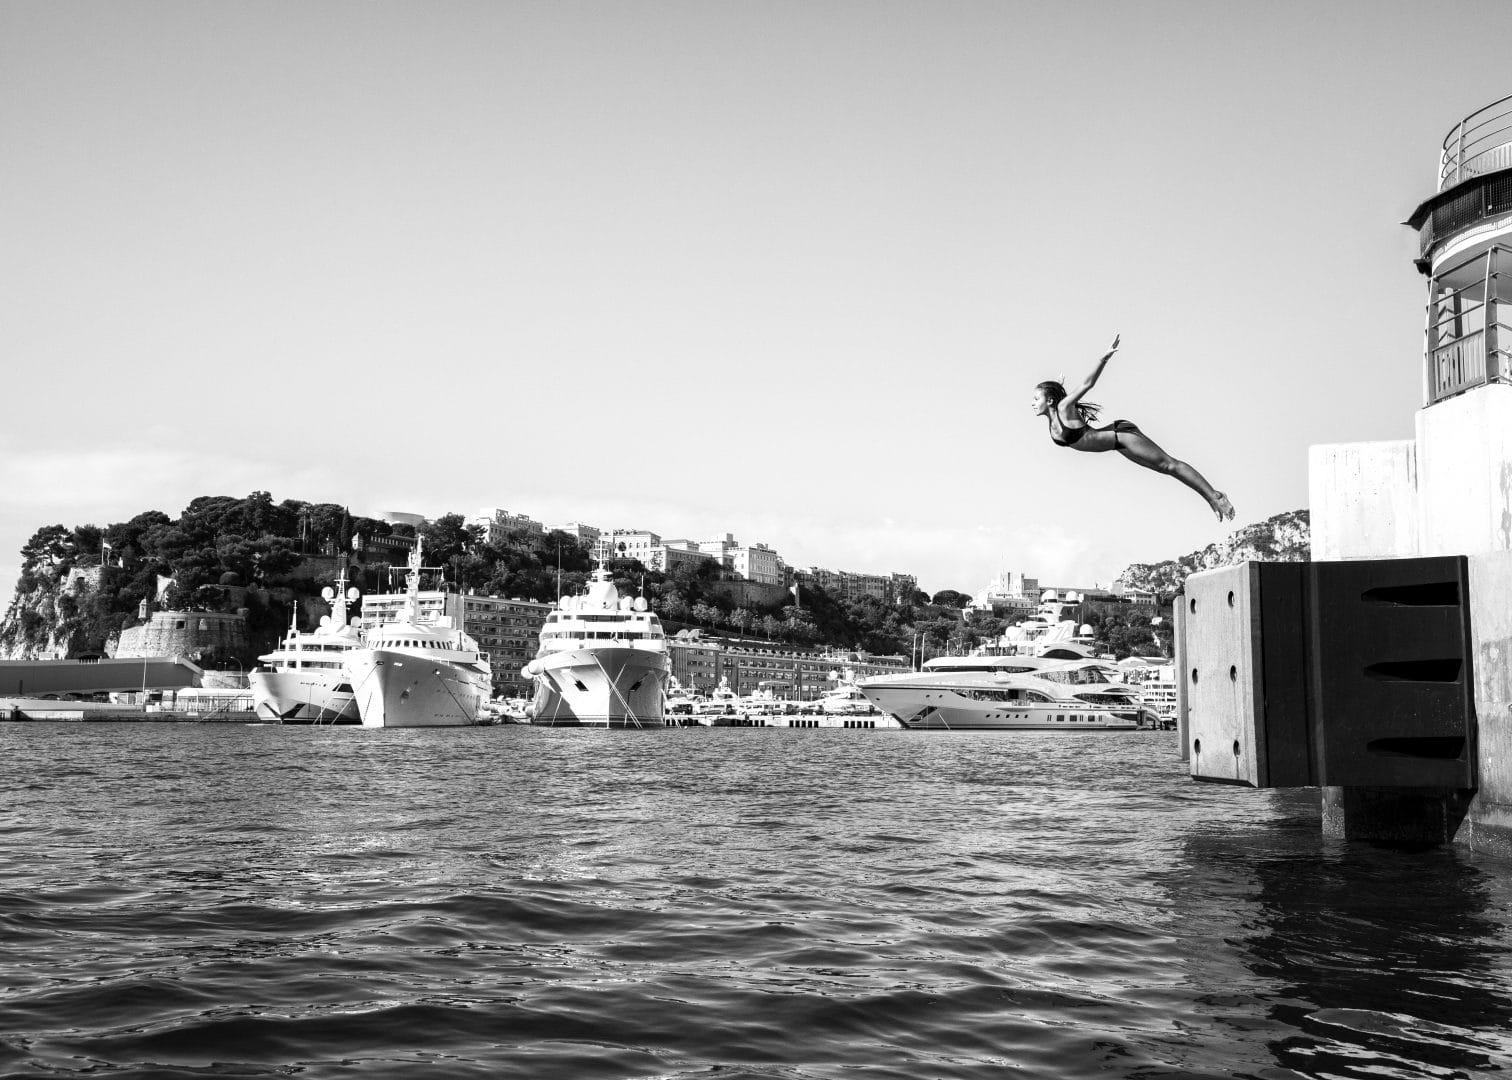 Werk: From the series CONCRETE / Monaco